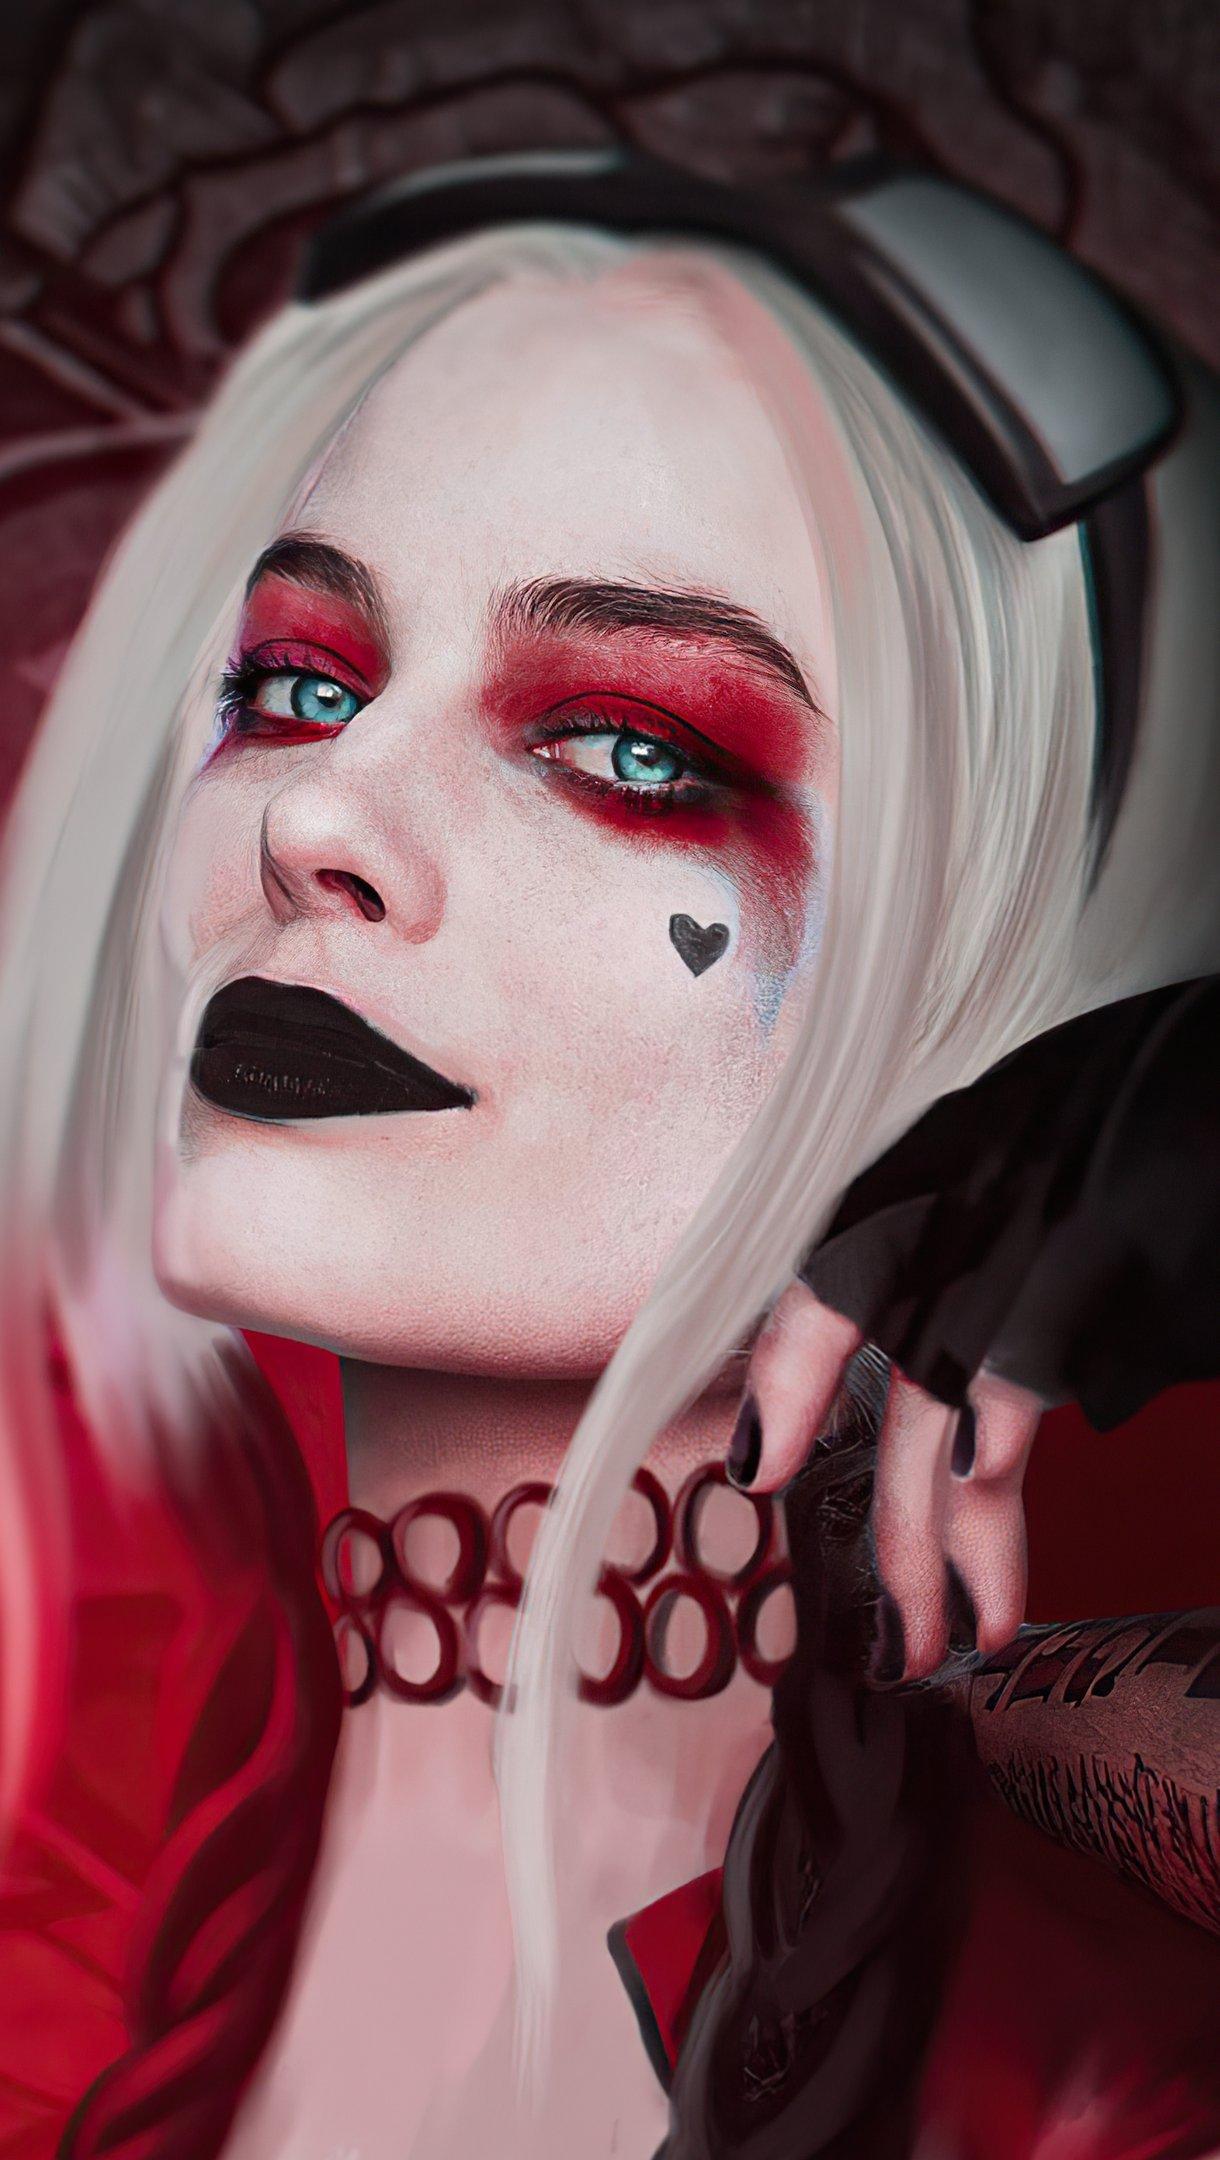 Fondos de pantalla Harley Quinn Margot Robbie Vertical